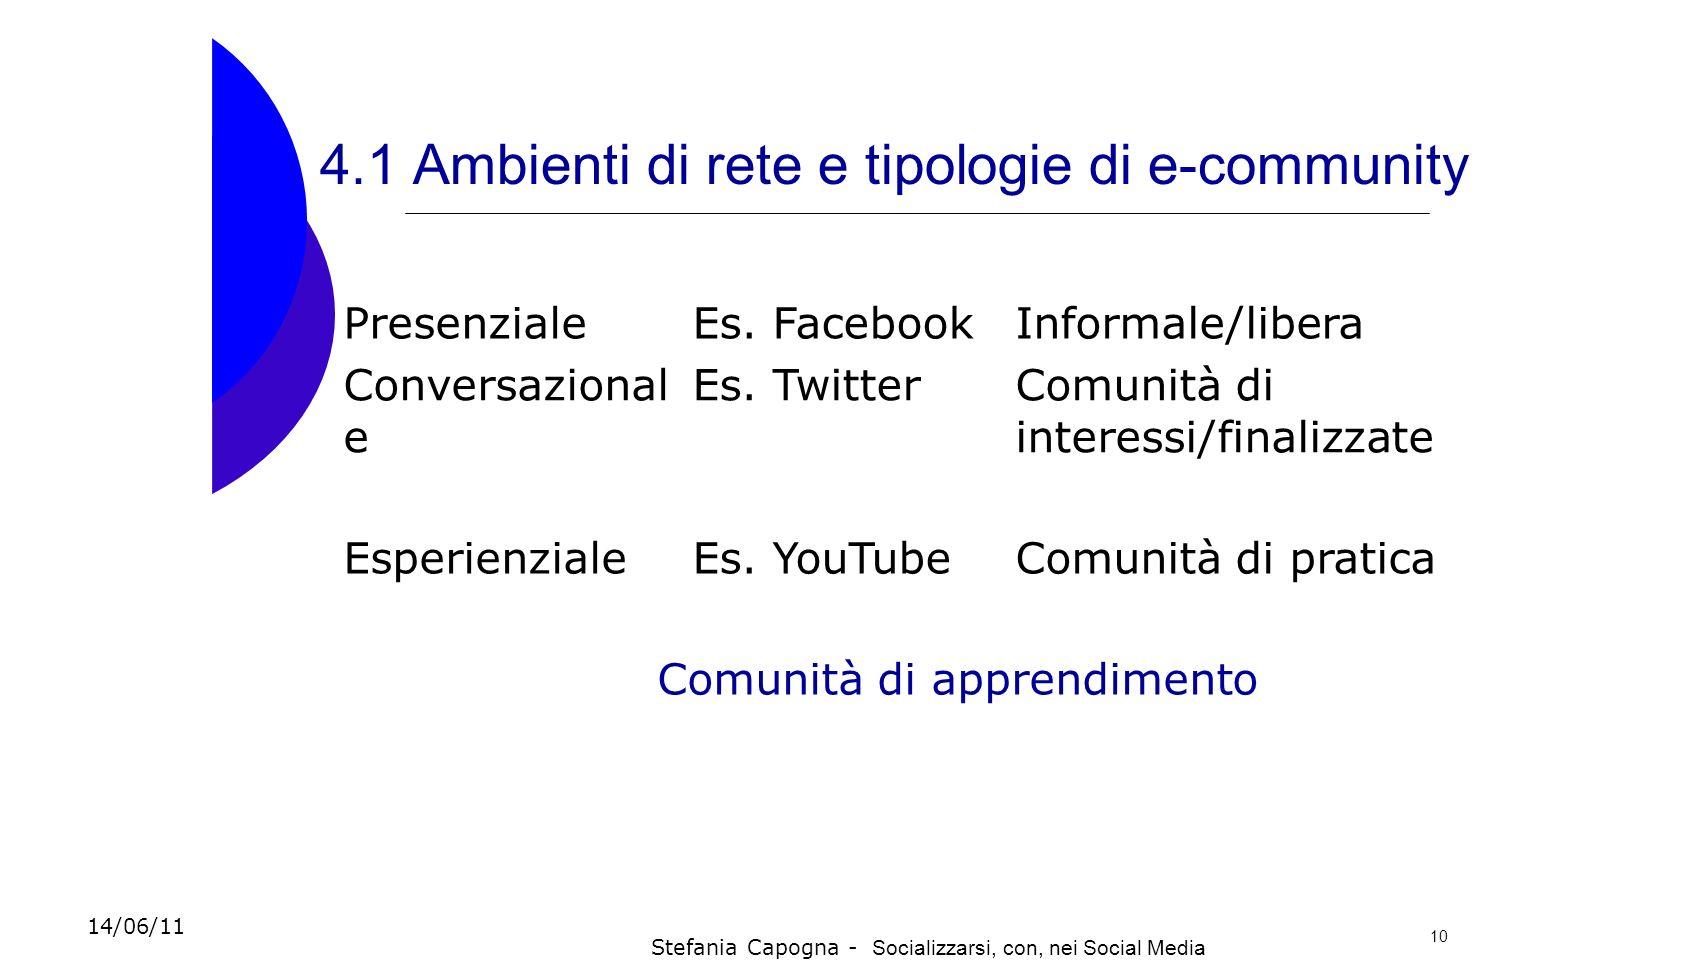 4.1 Ambienti di rete e tipologie di e-community PresenzialeEs. FacebookInformale/libera Conversazional e Es. TwitterComunità di interessi/finalizzate